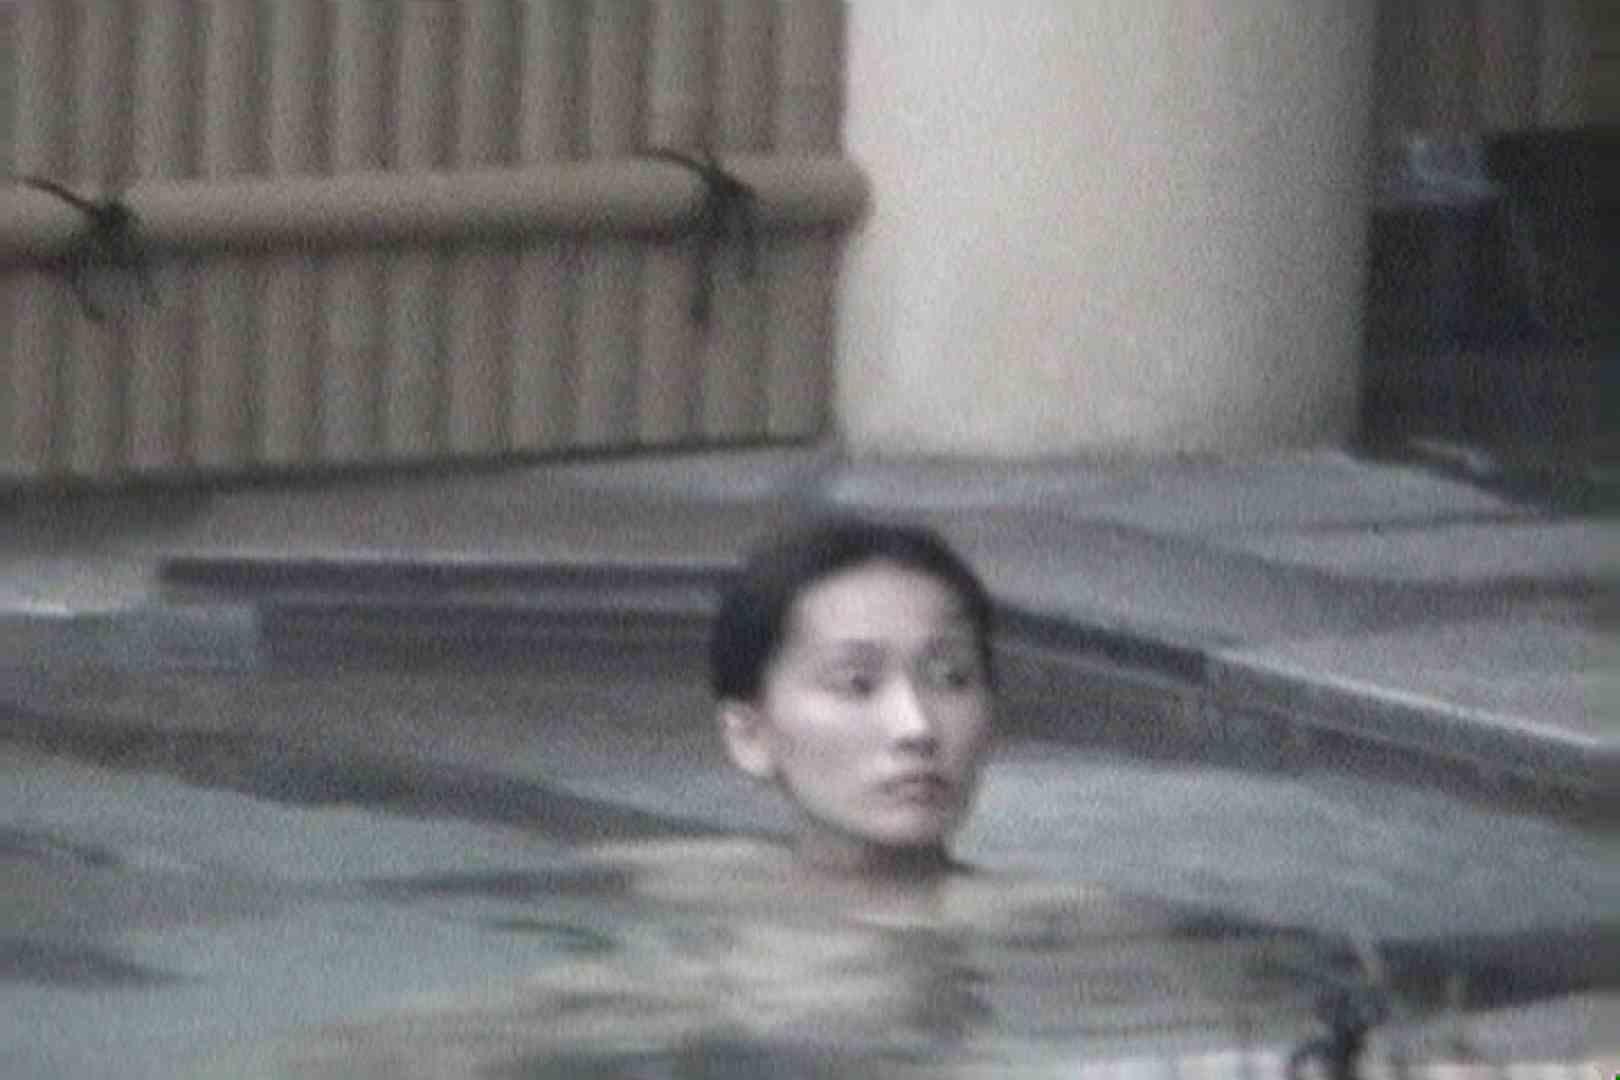 Aquaな露天風呂Vol.557 盗撮 盗み撮り動画キャプチャ 34連発 2